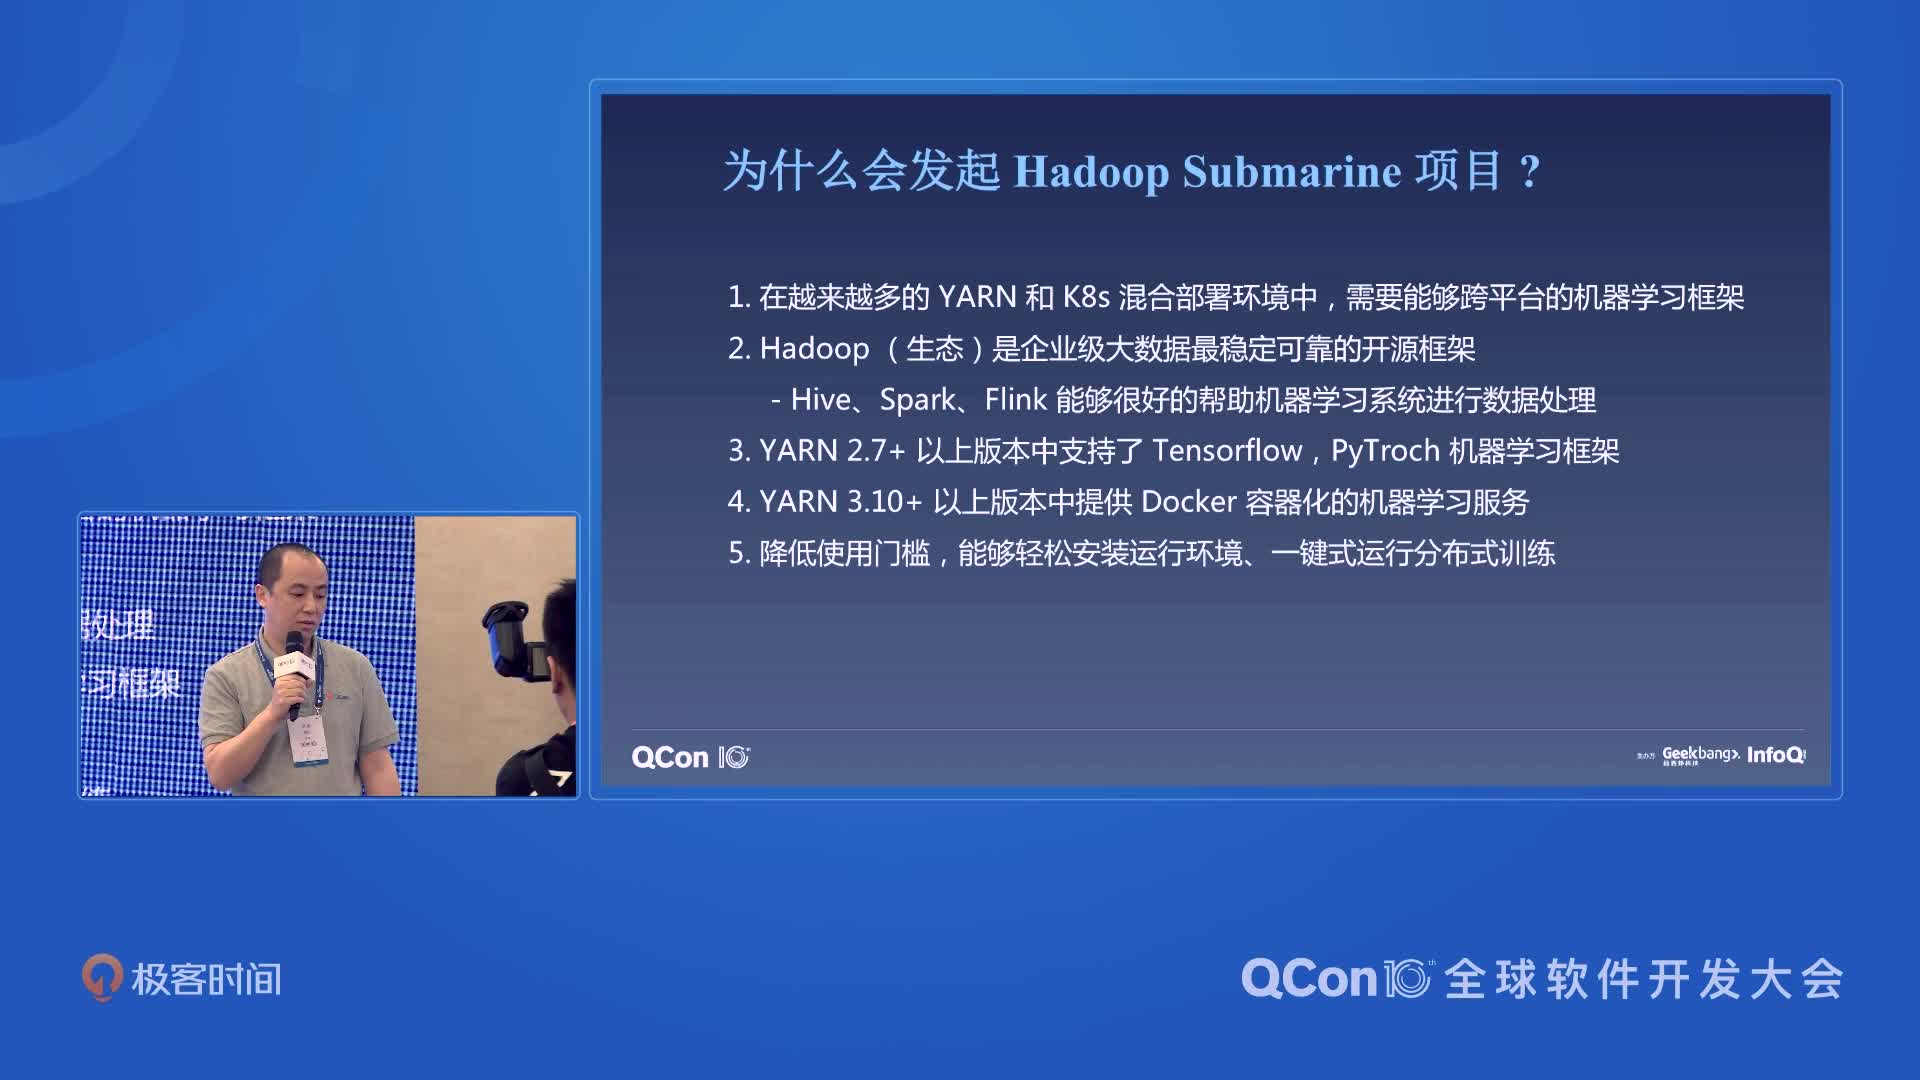 Apache Hadoop 机器学习引擎 Submarine 及生态 | QCon